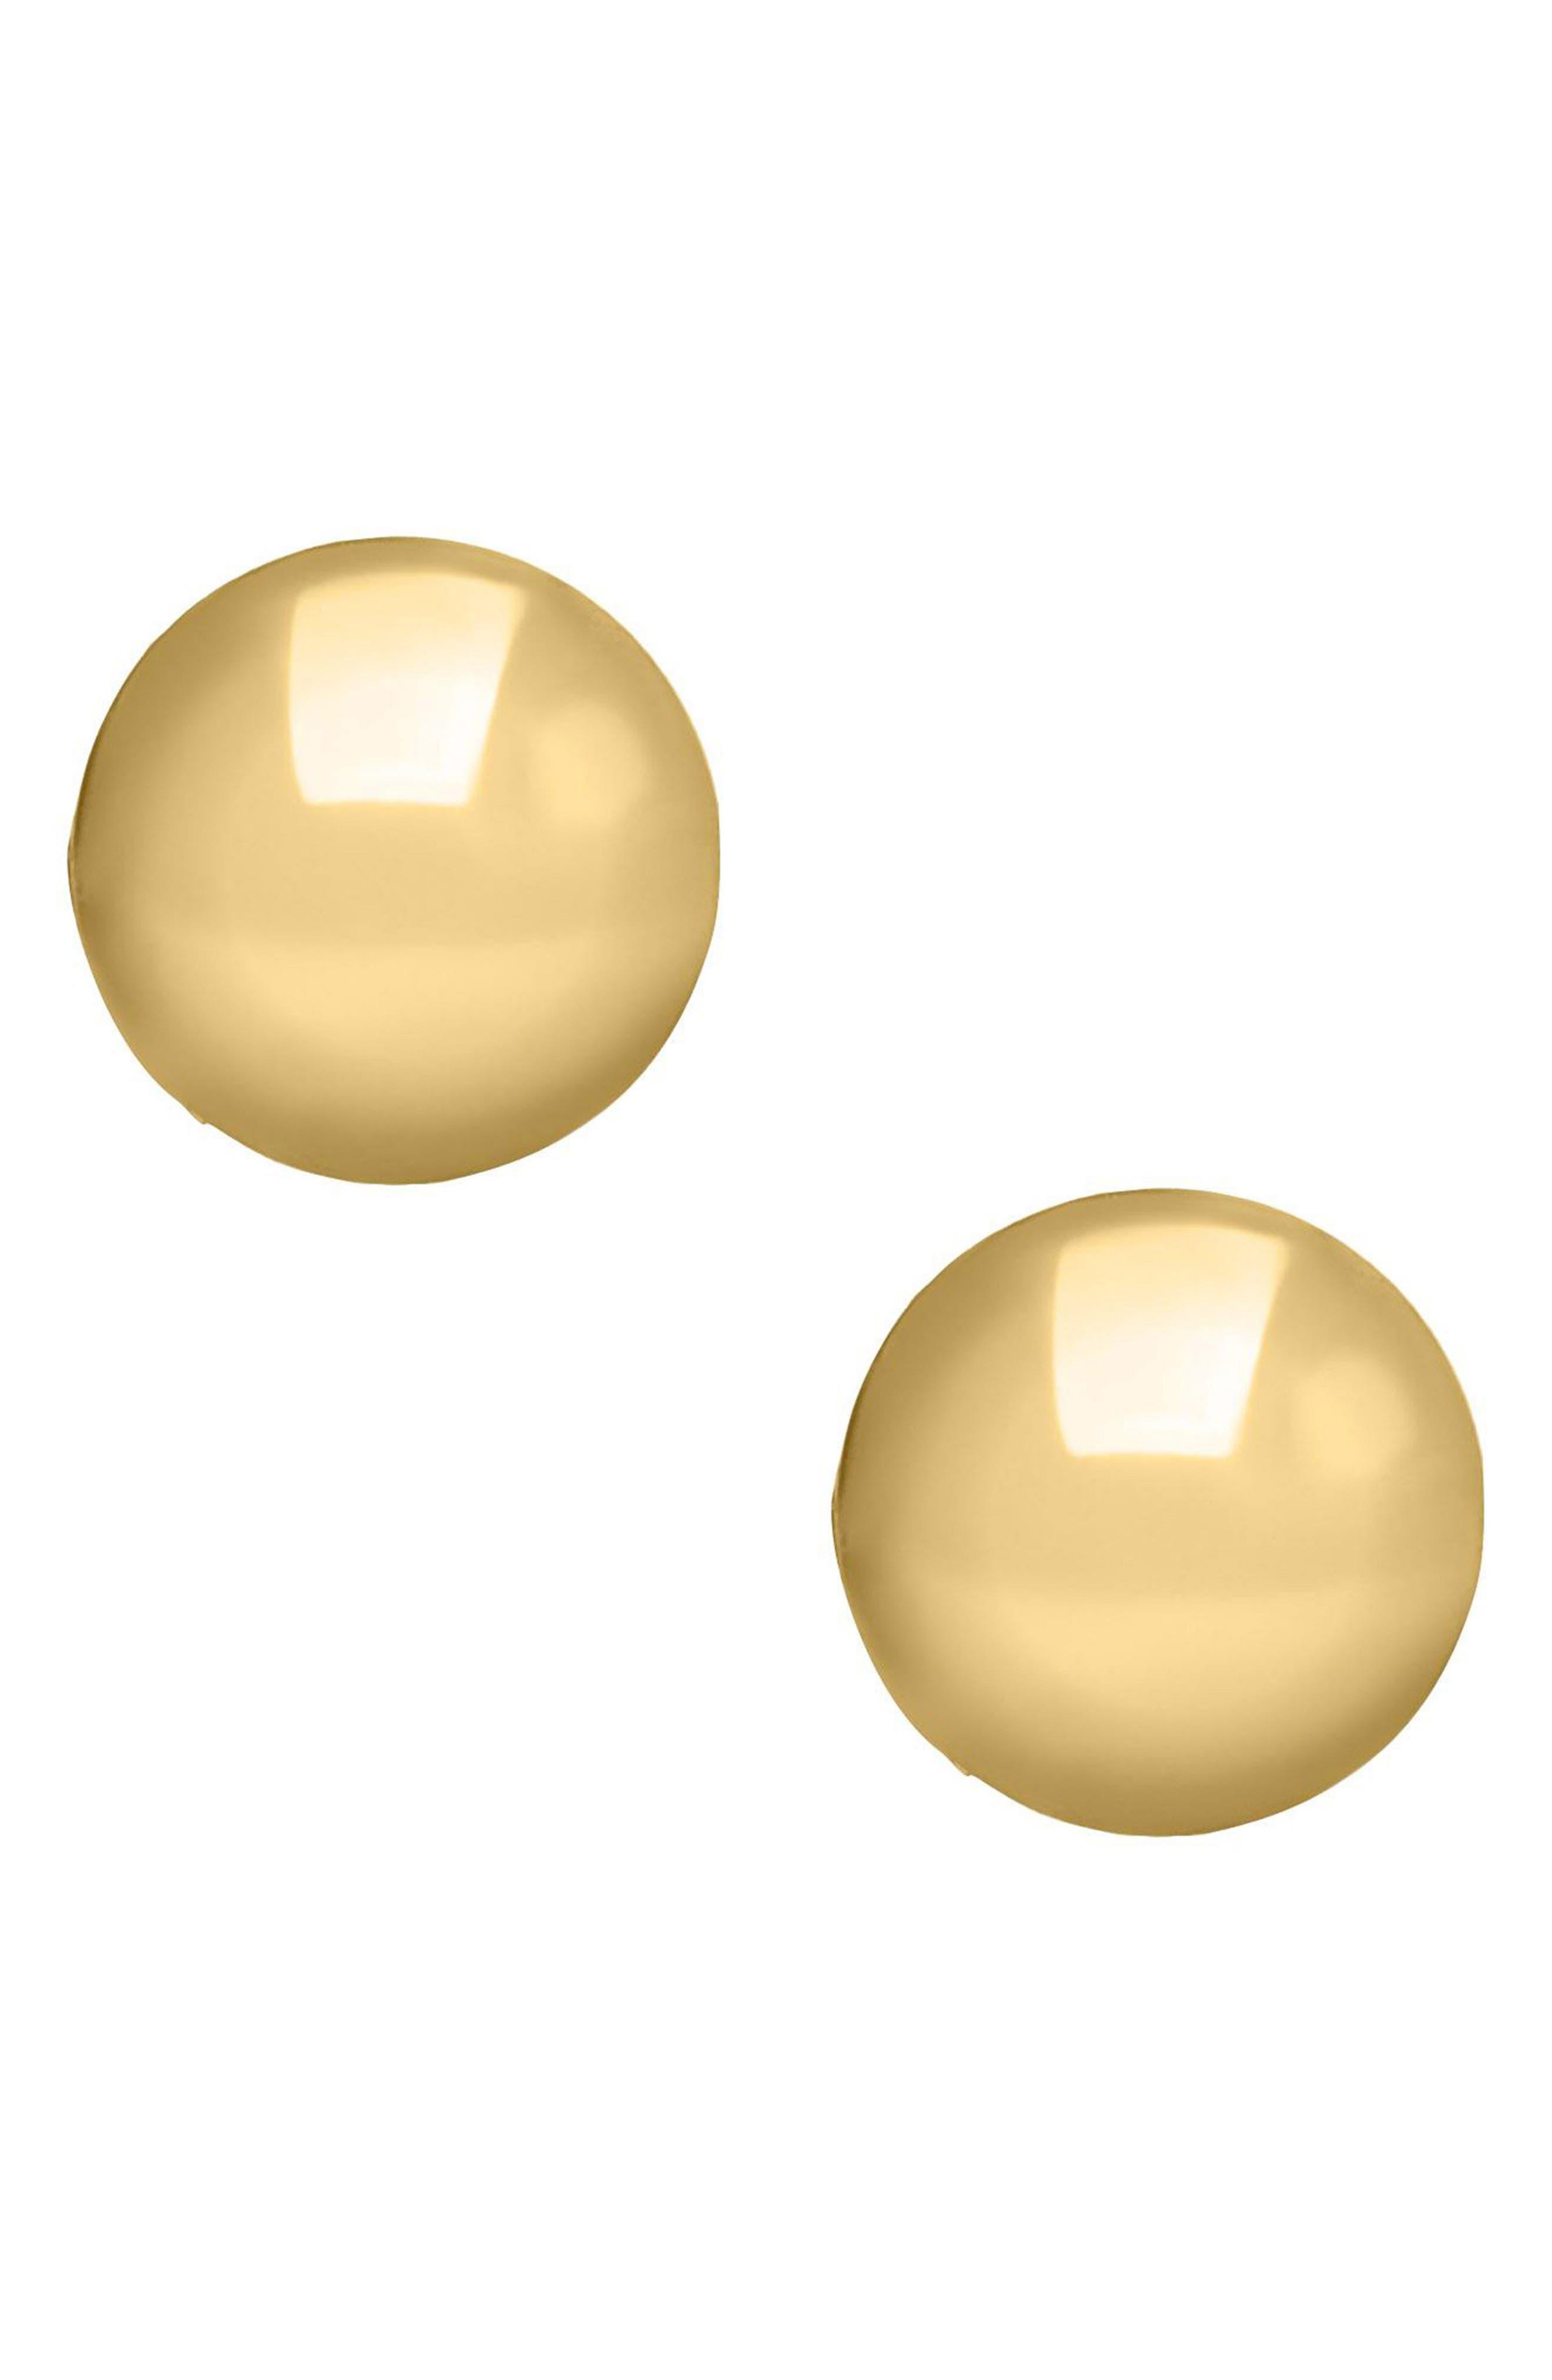 14k Gold Ball Earrings,                             Main thumbnail 1, color,                             GOLD